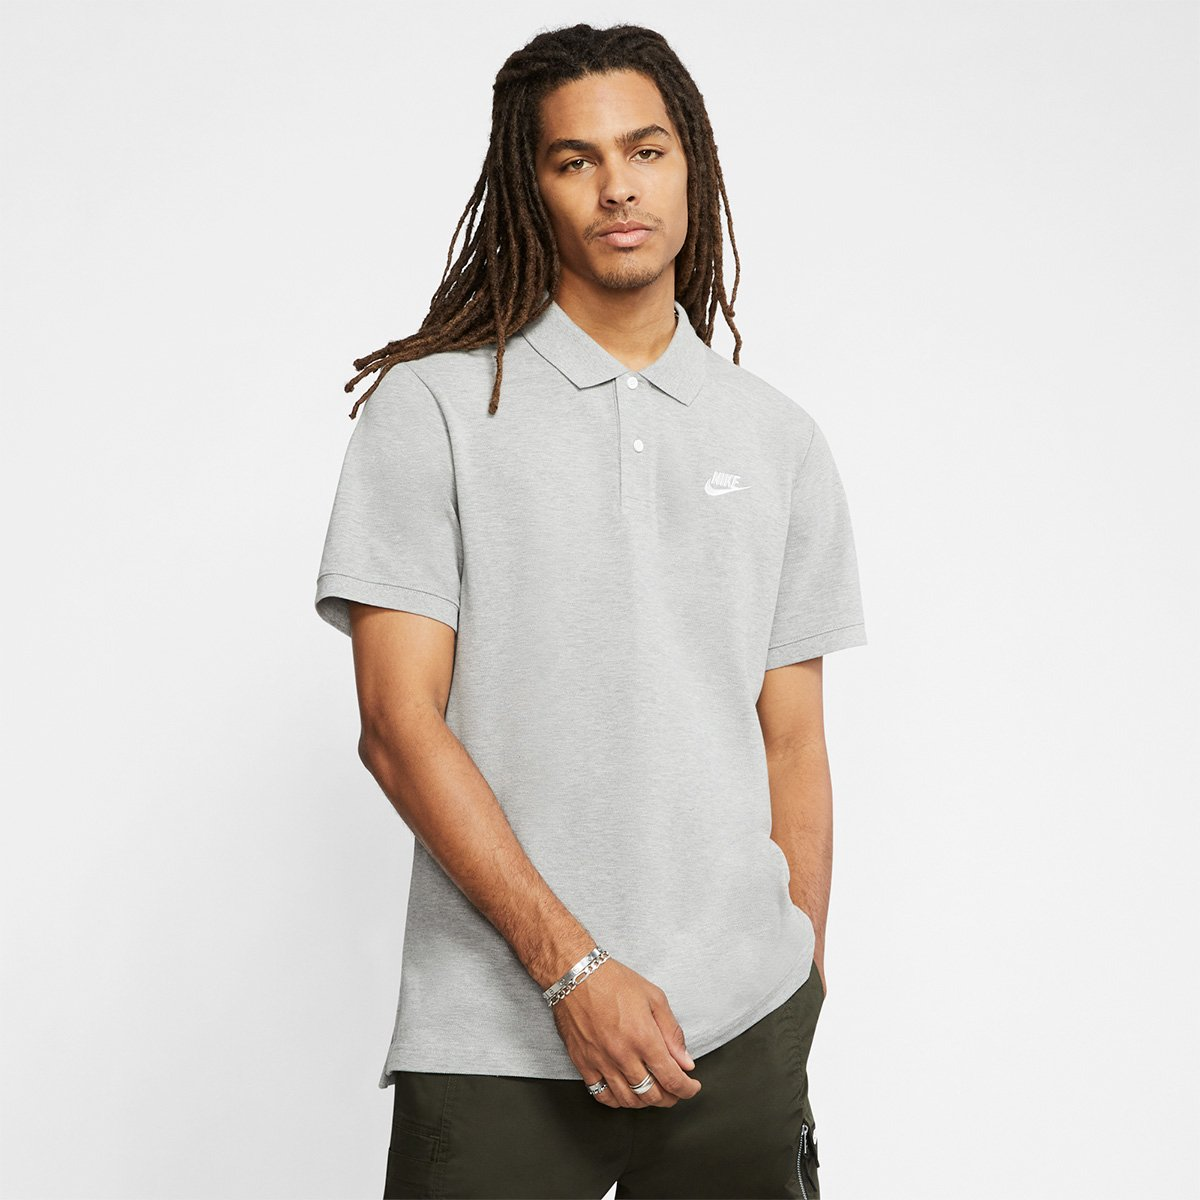 Camisa Polo Nike Sportswear Masculina